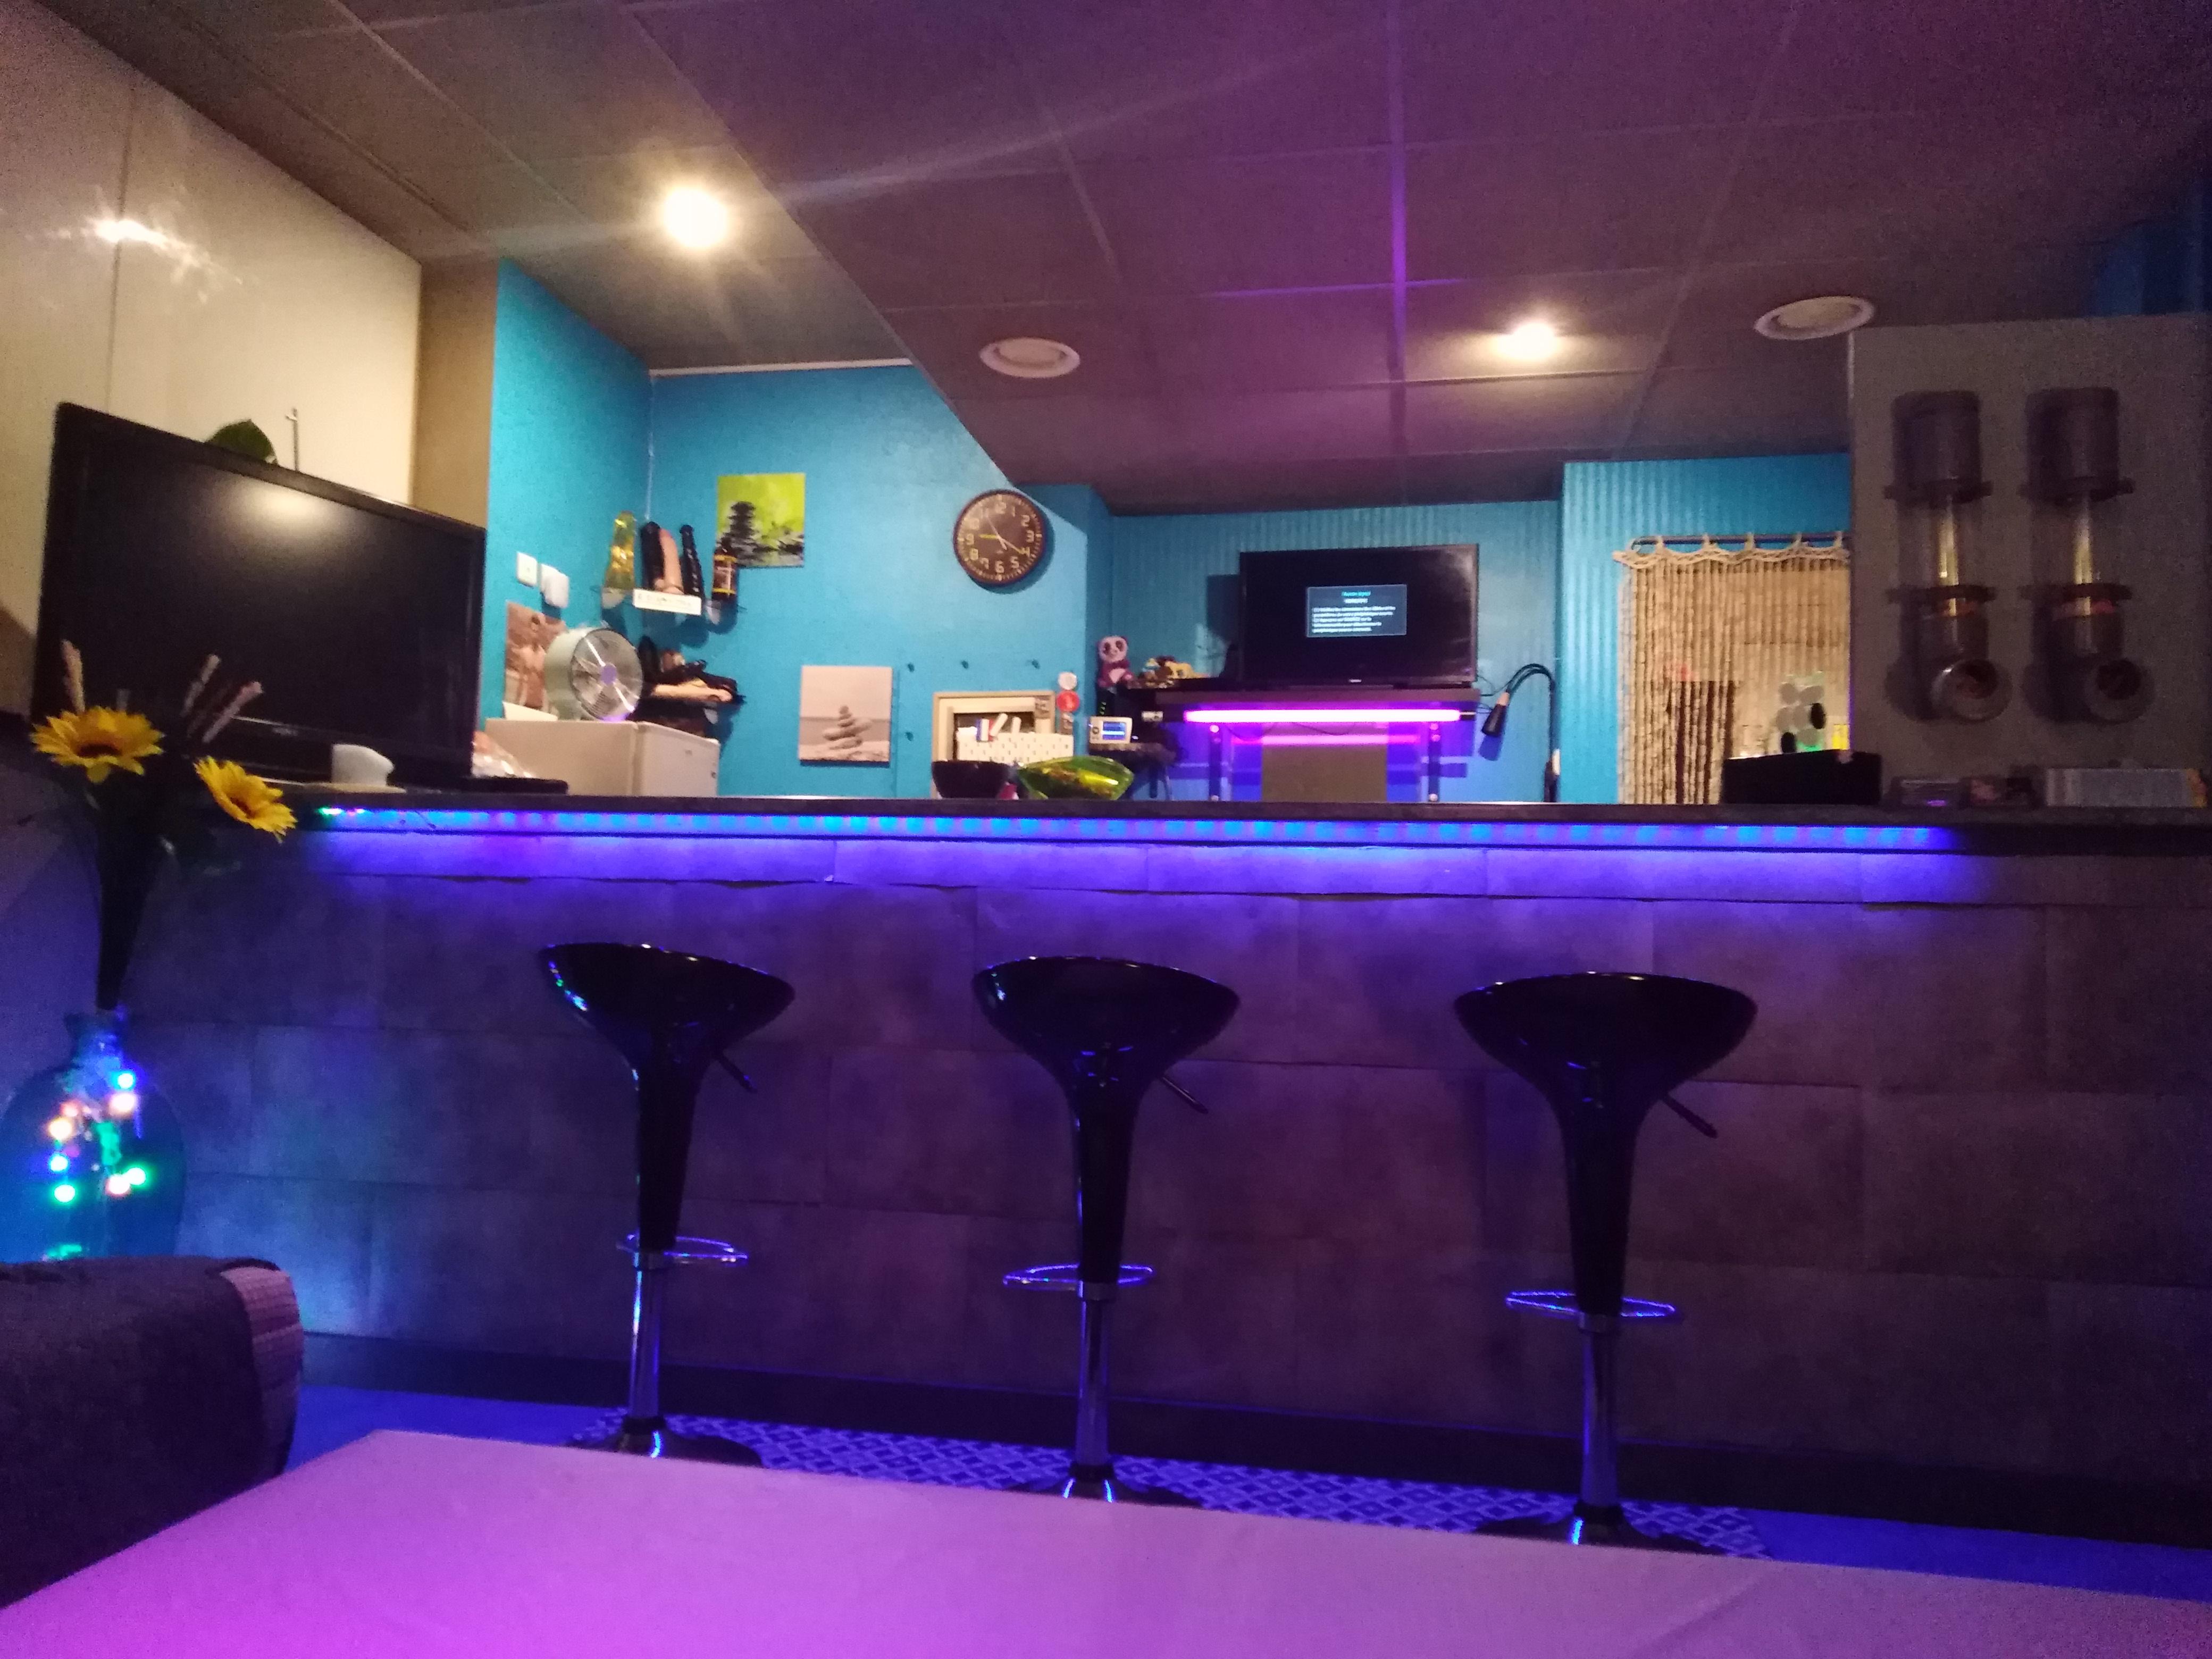 bar - Blue club sauna pour homme Metz proche gare de Metz